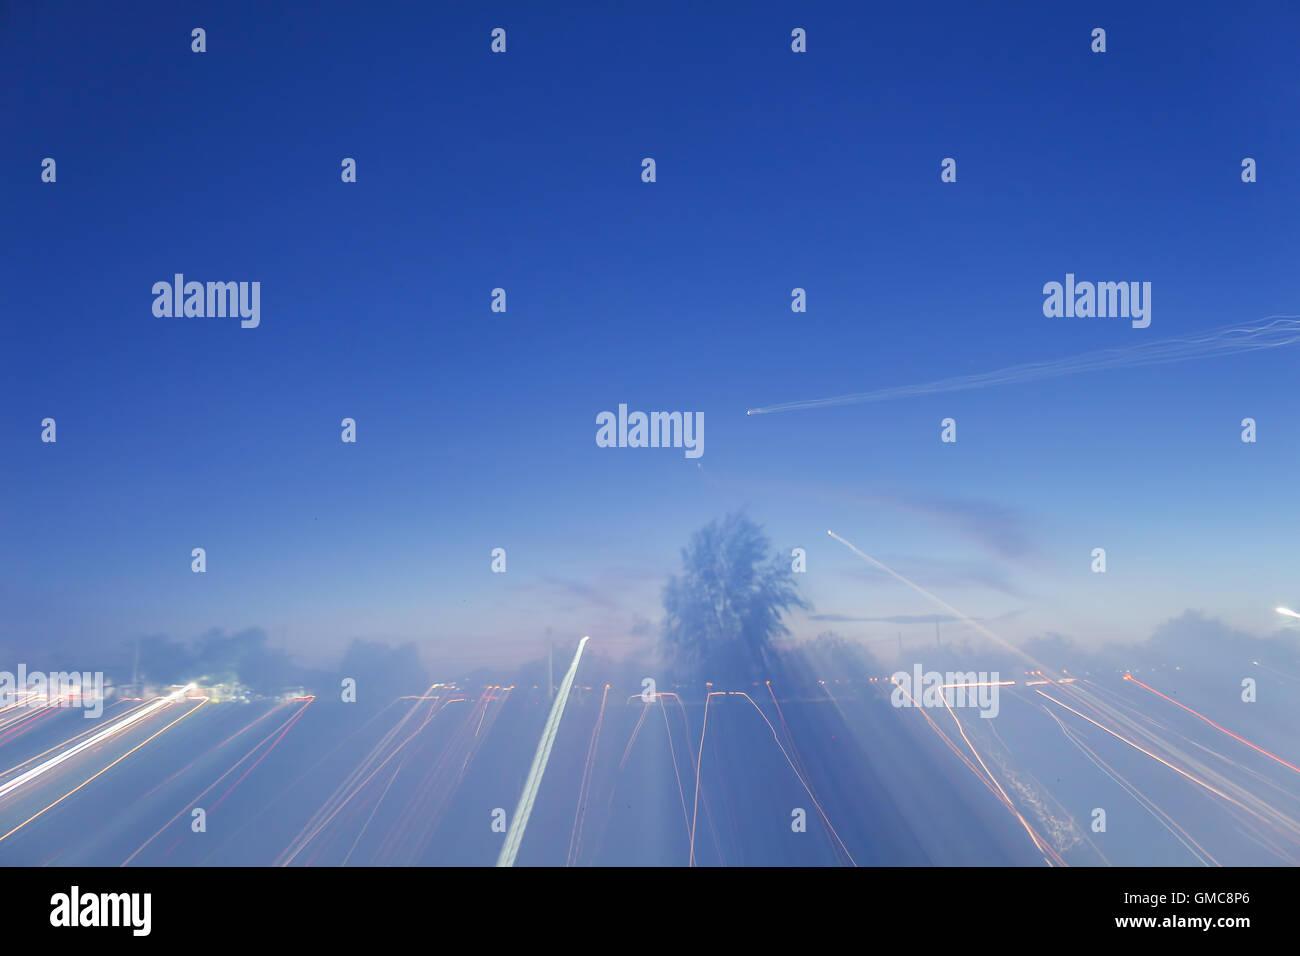 Dance the night light blurred background pattern. - Stock Image